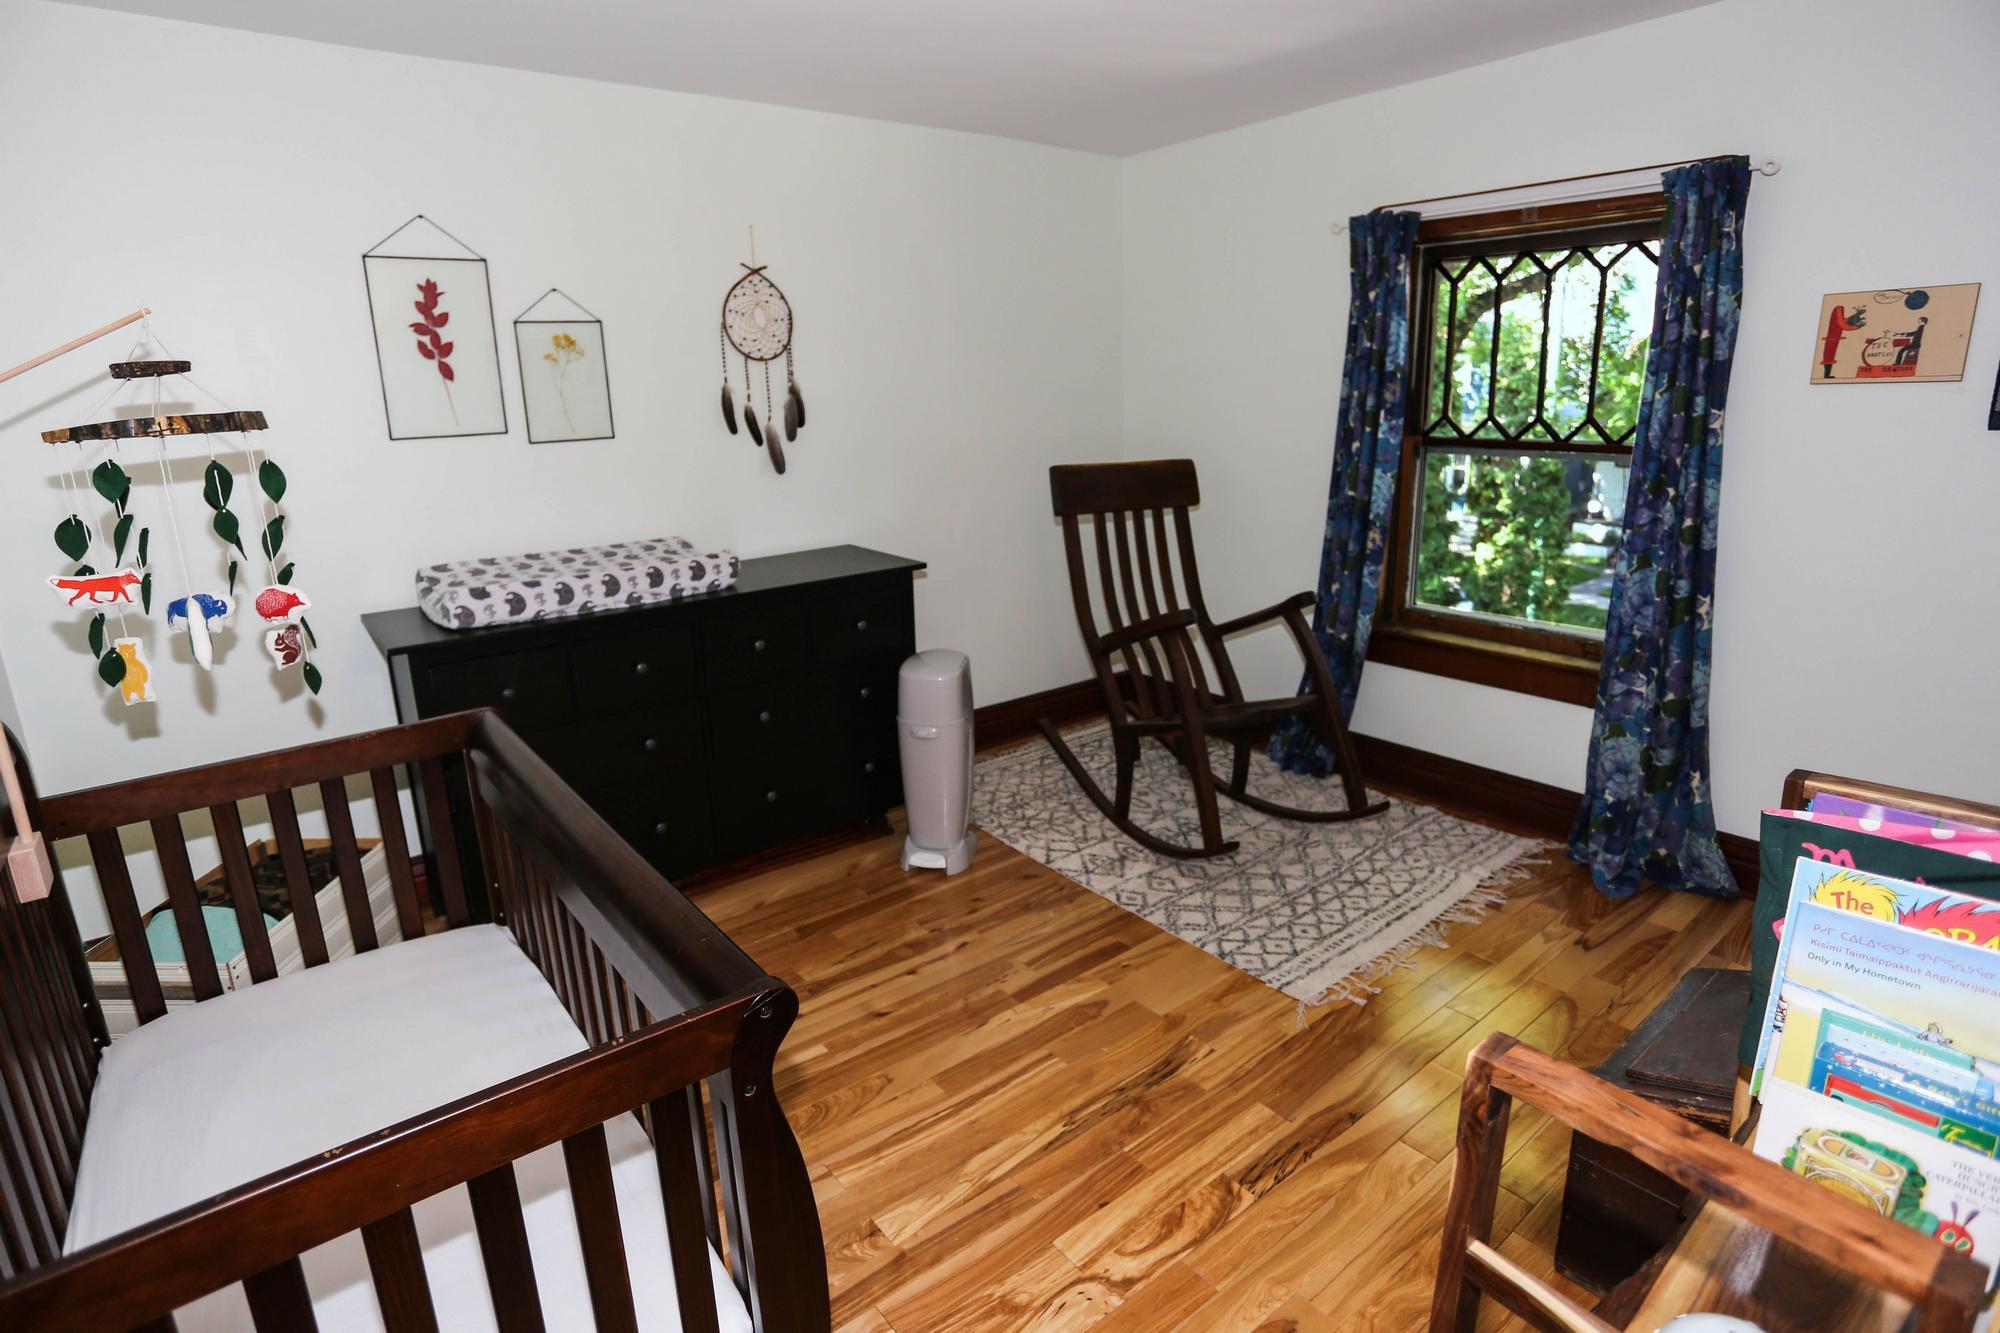 Photo 21: Photos: 105 Evanson Street in Winnipeg: Wolseley Single Family Detached for sale (5B)  : MLS®# 1821900